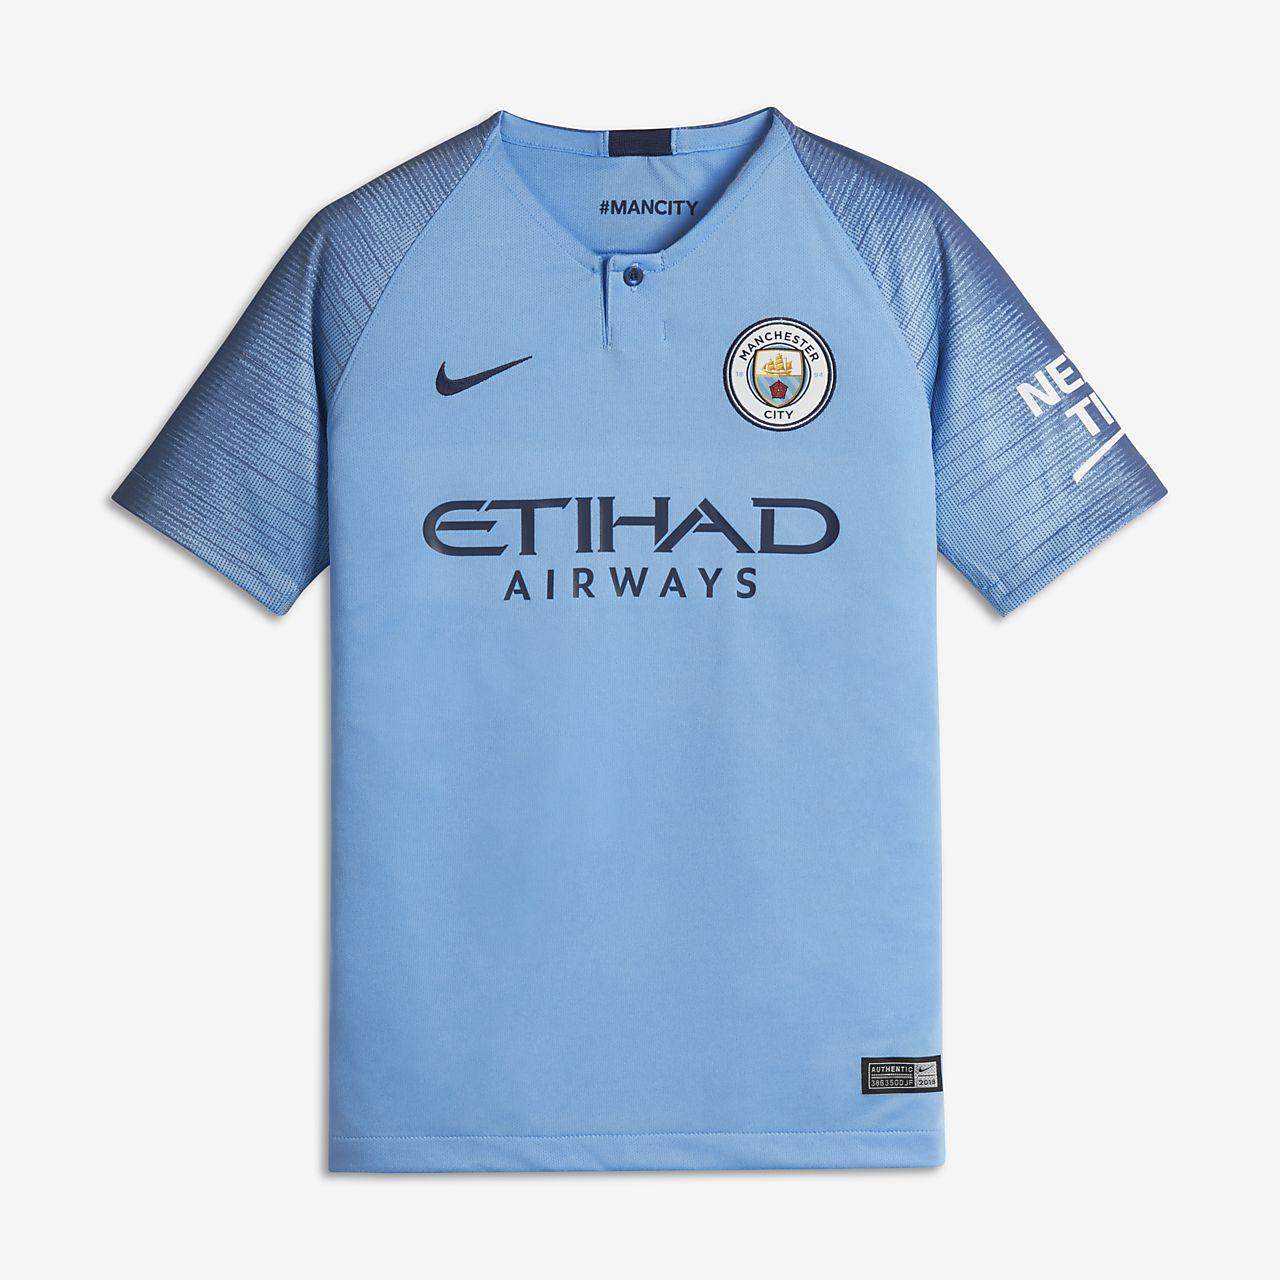 Allenamento calcio Manchester City vendita